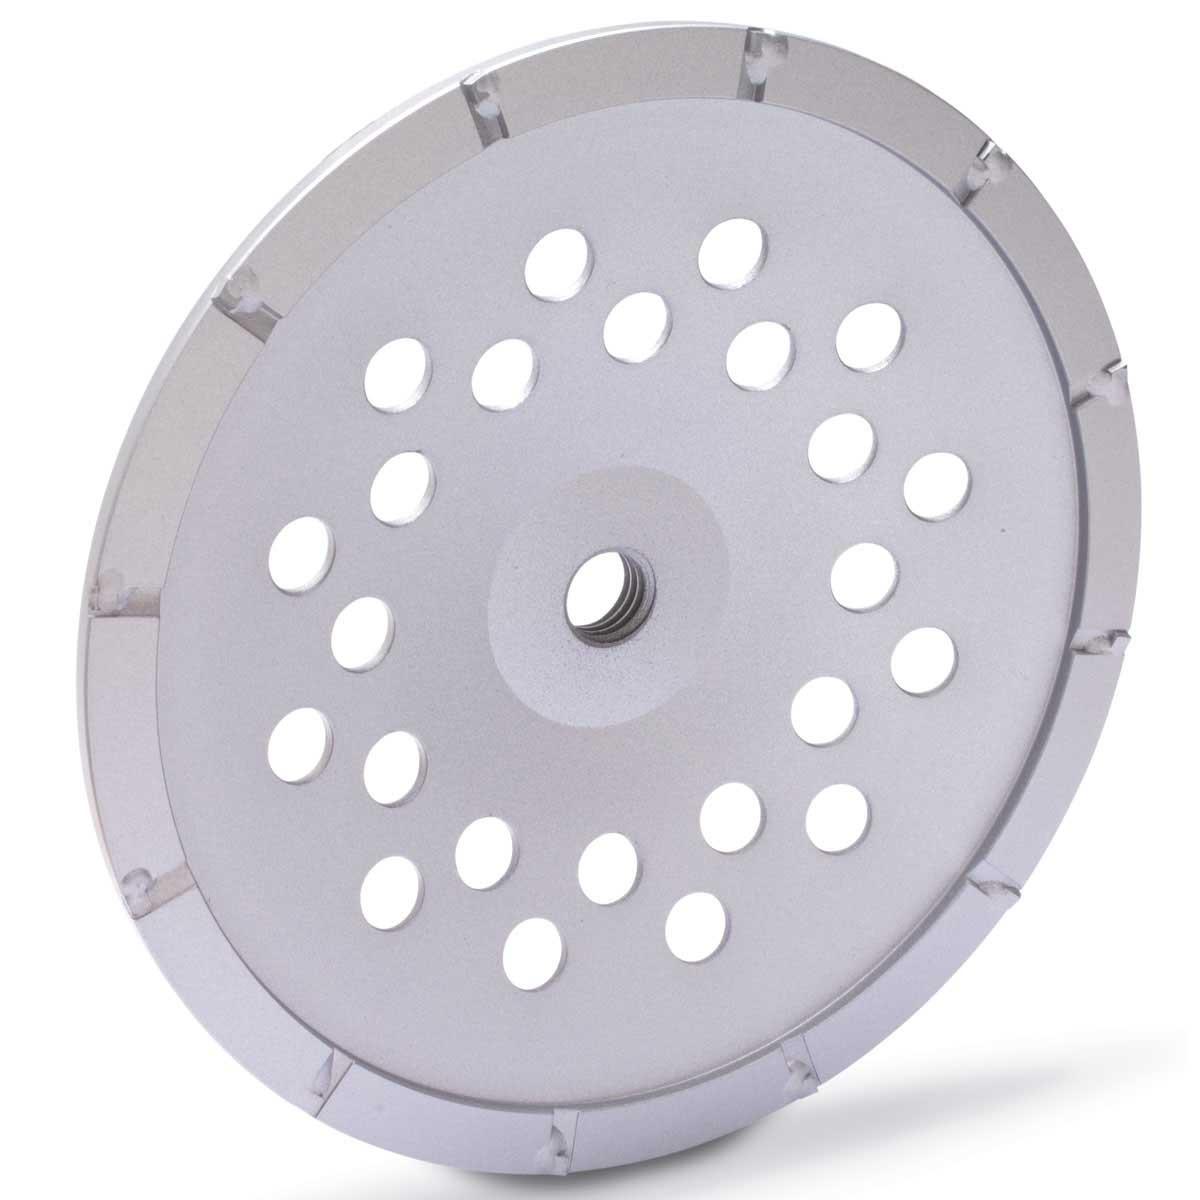 MK-604CG-1 Single Row PCD Cup Wheel